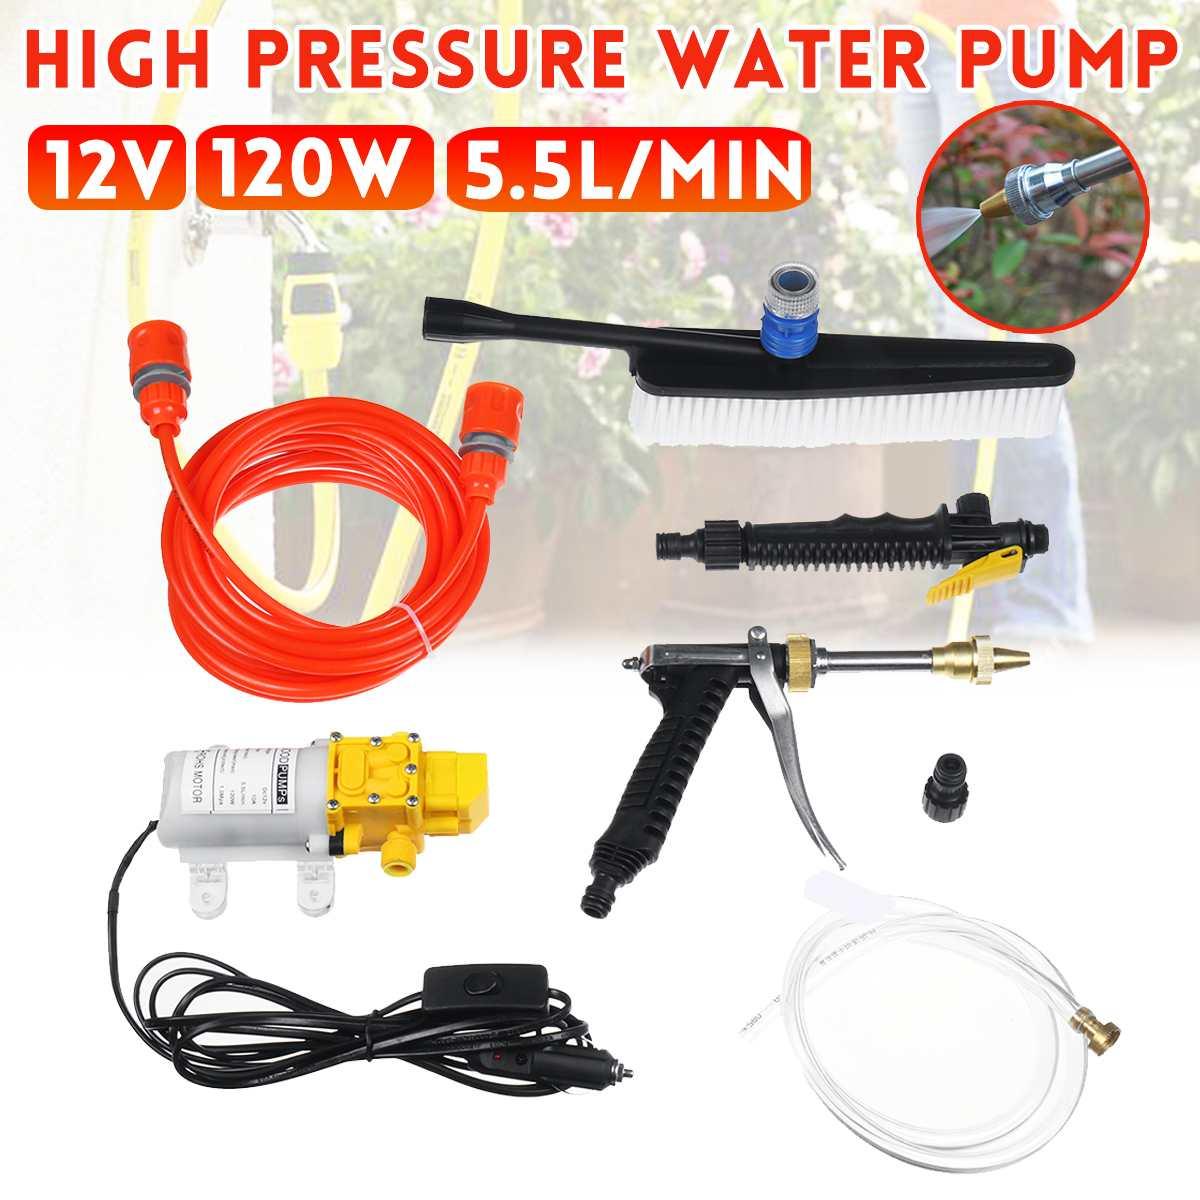 12V 100W Portable Car Washer Guns Pump Car Sprayer High Pressure Cleaner Electric Cleaning Auto Device Car Care Washing Machine